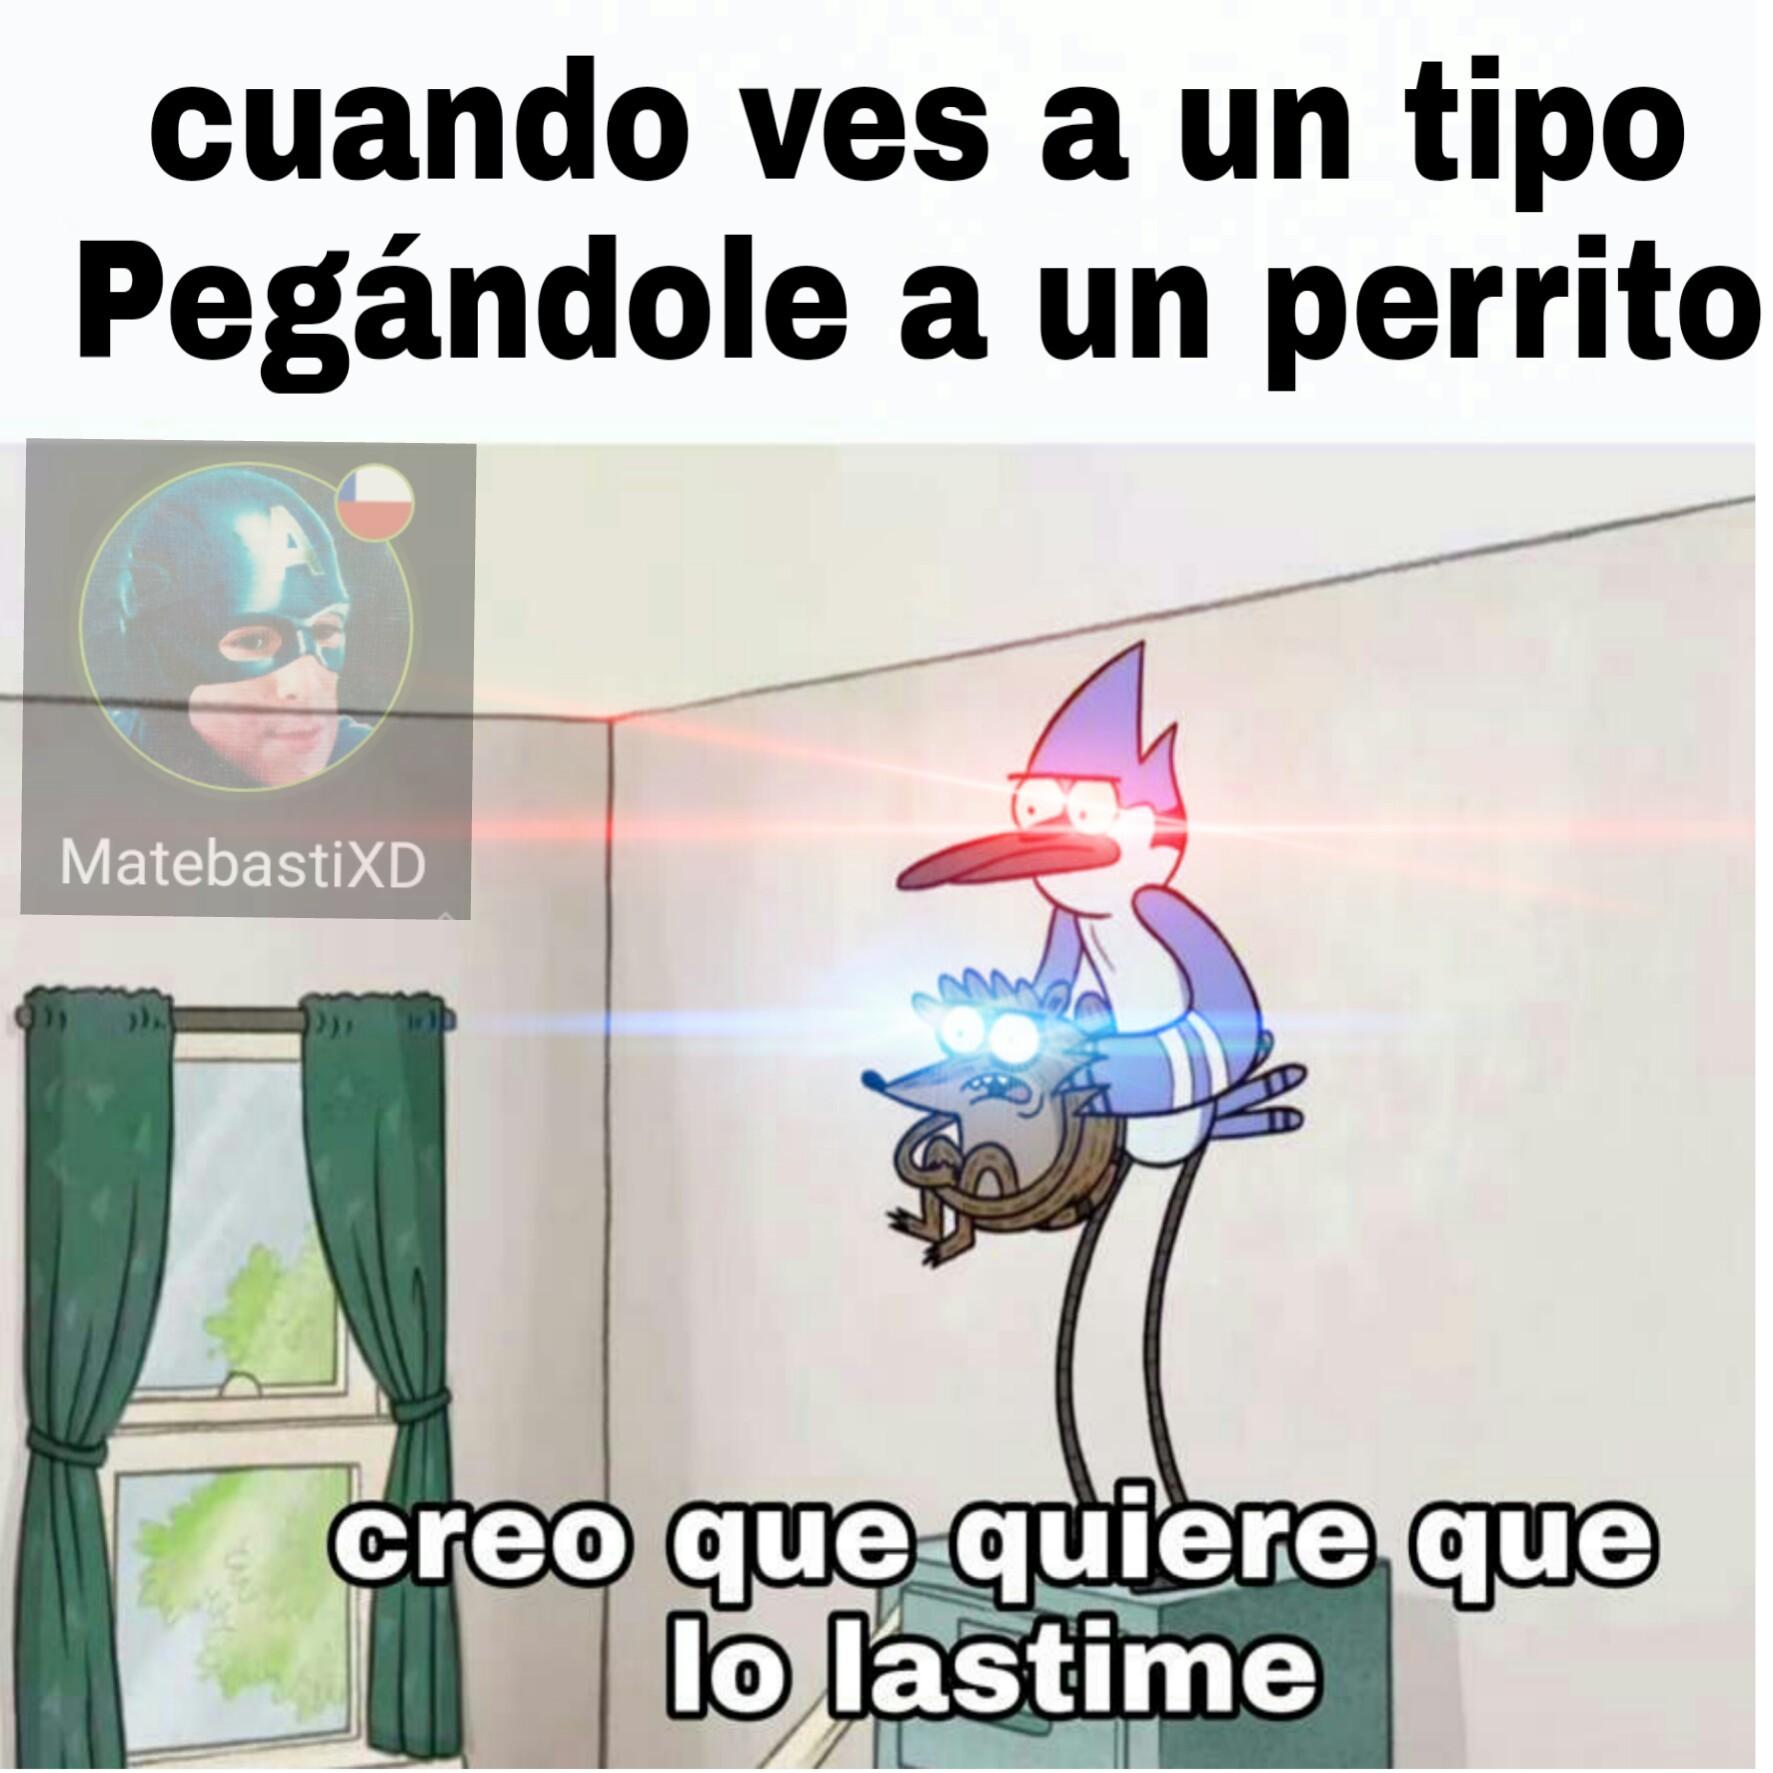 Hopolapa - meme